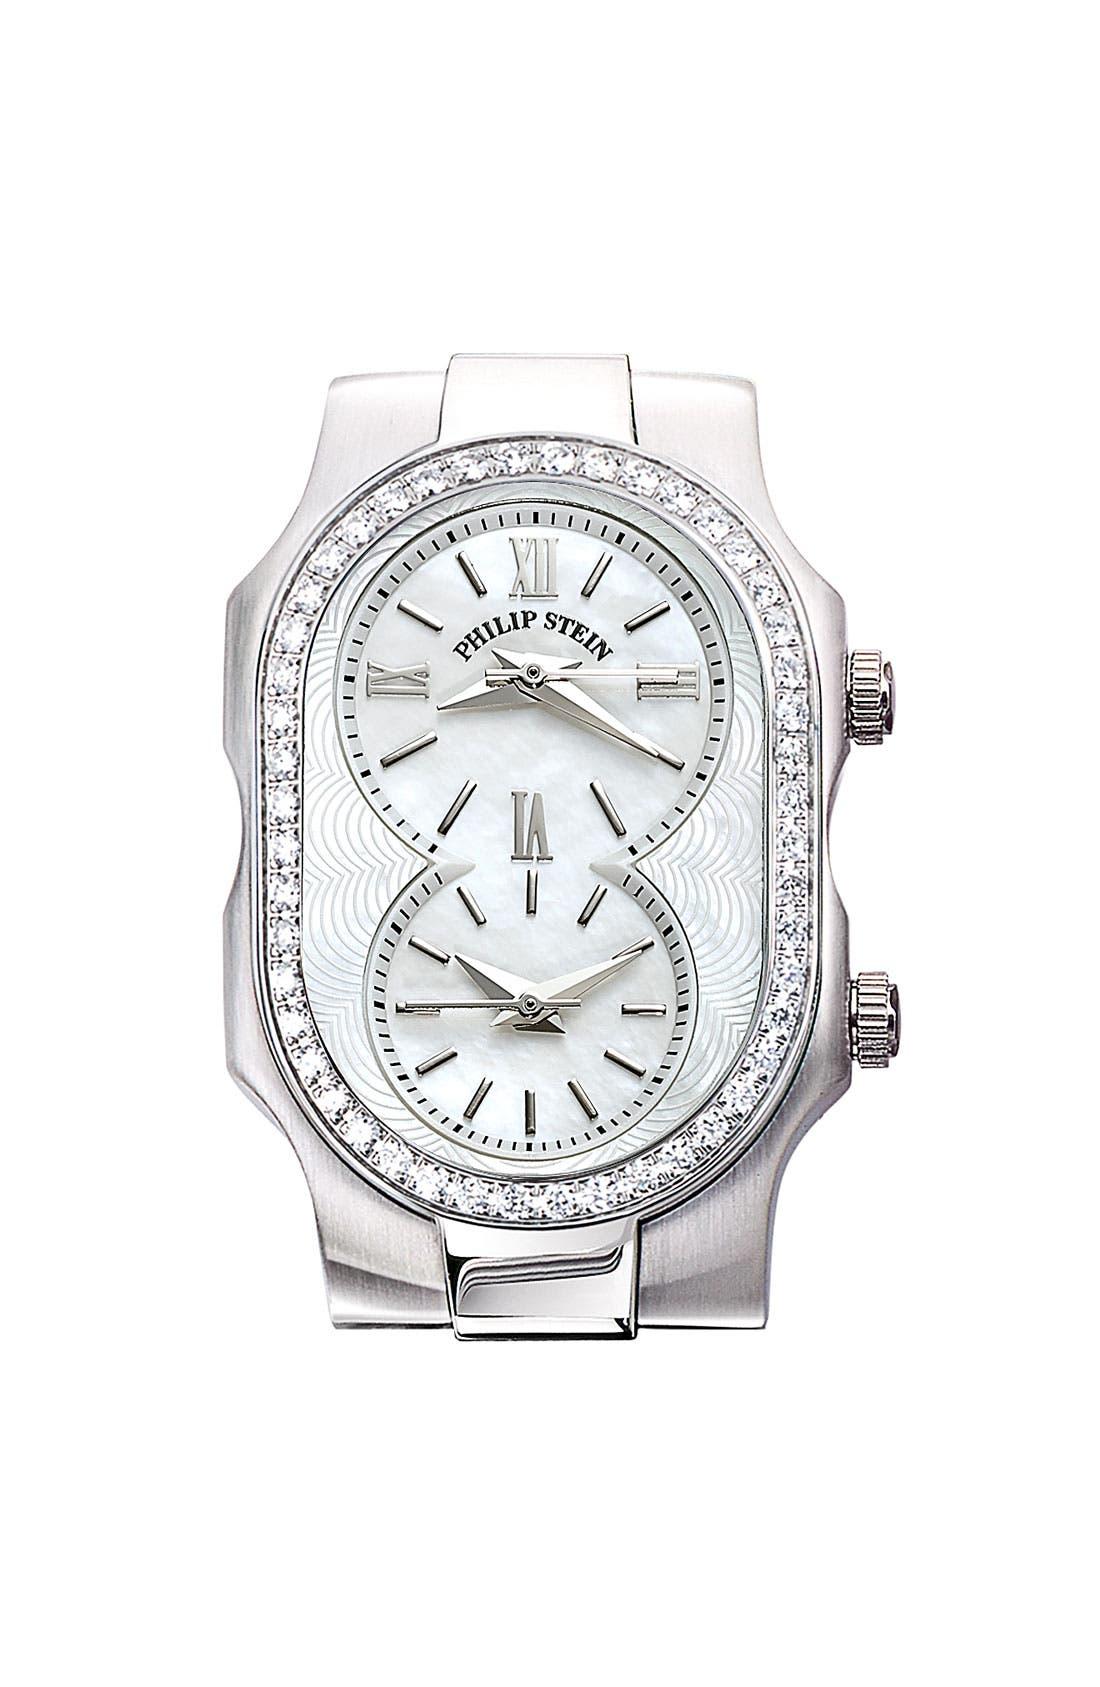 Main Image - Philip Stein® 'Signature' Small Diamond Watch Case